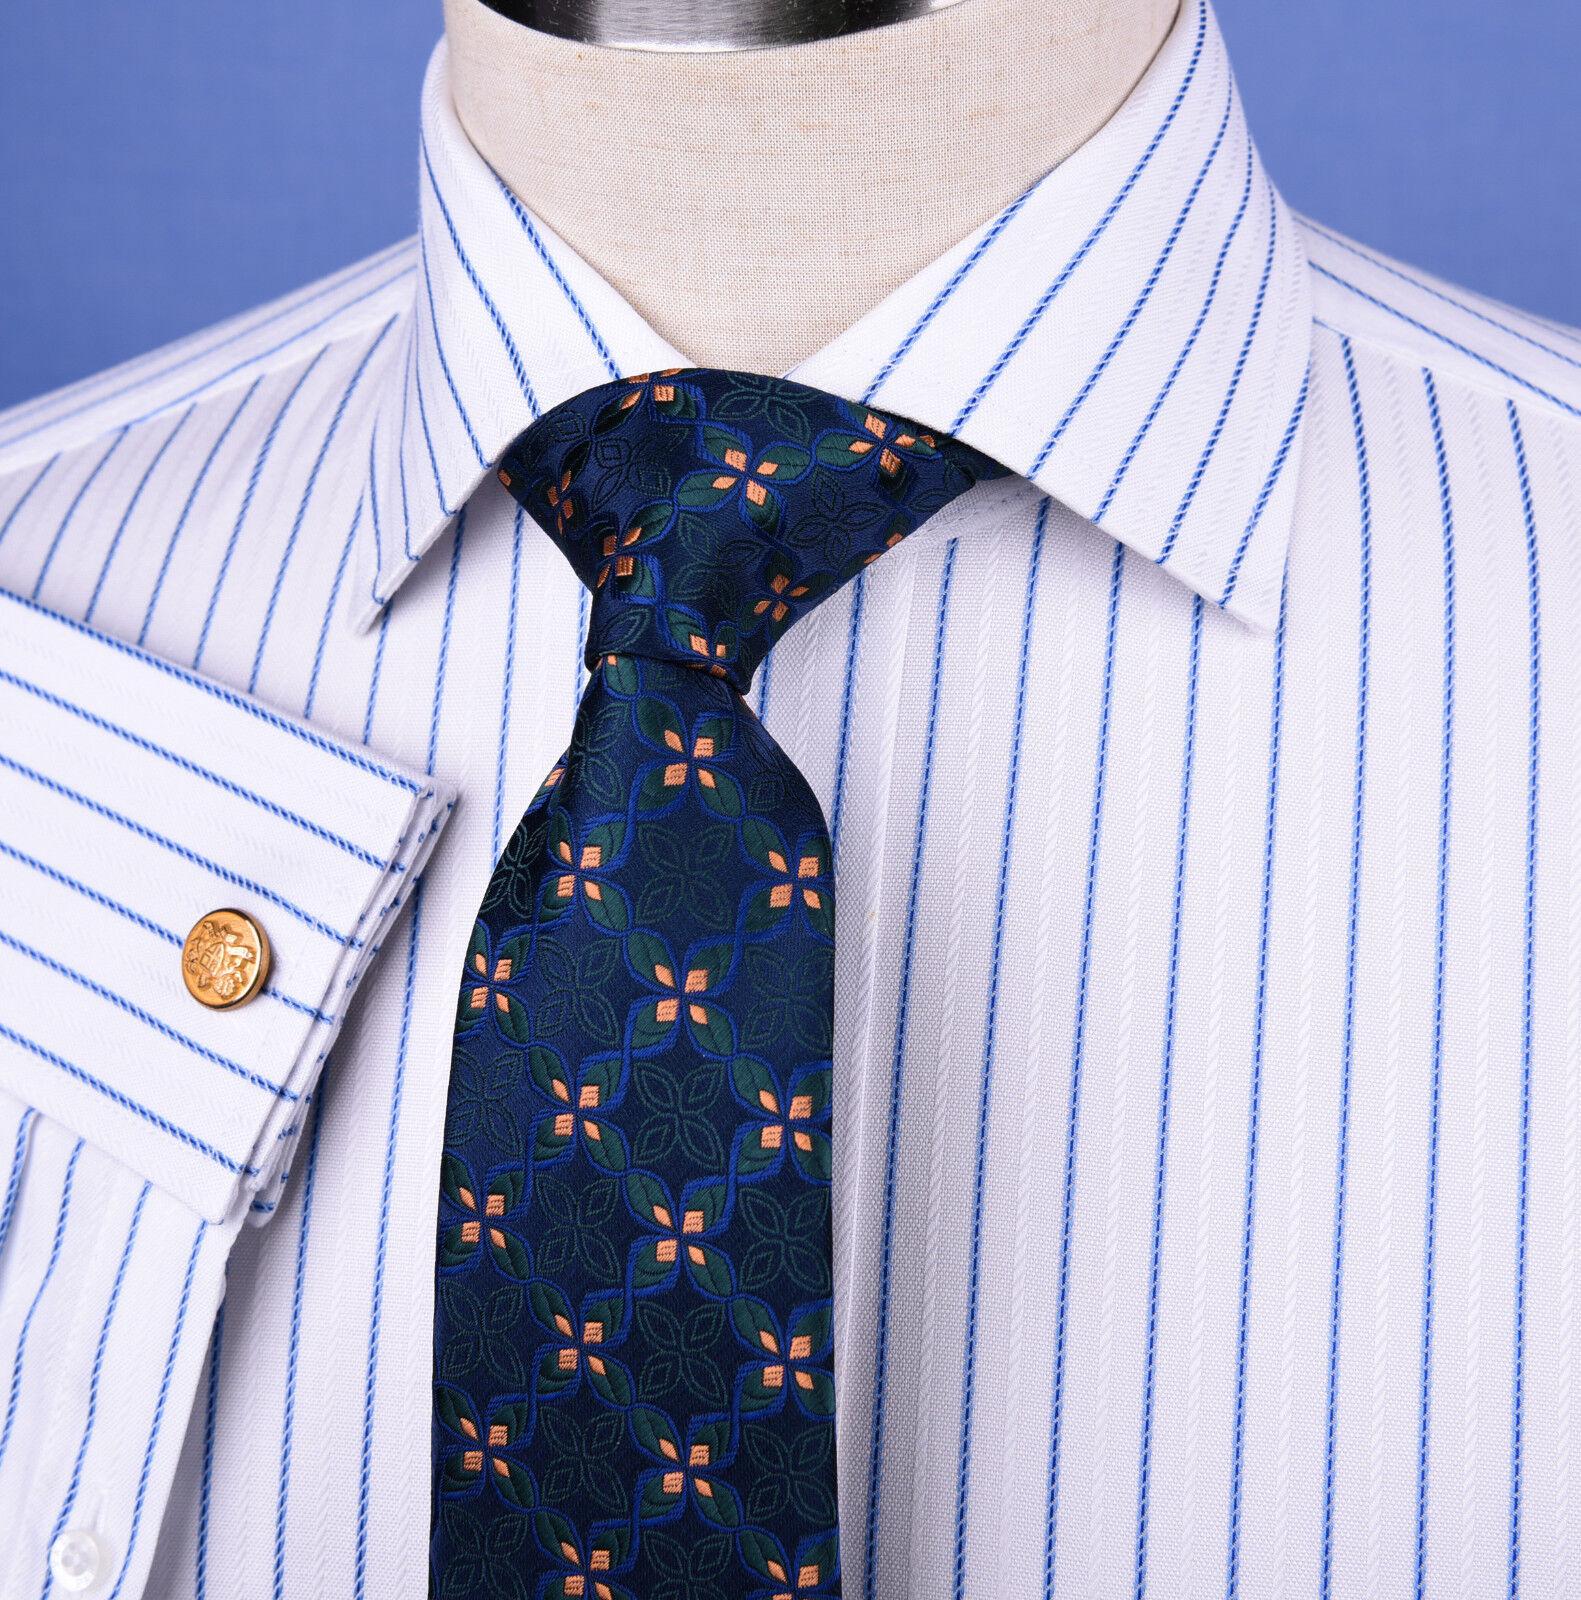 Light bluee Striped Dress Shirt Formal Business Designer Stripes Stylish Fashion